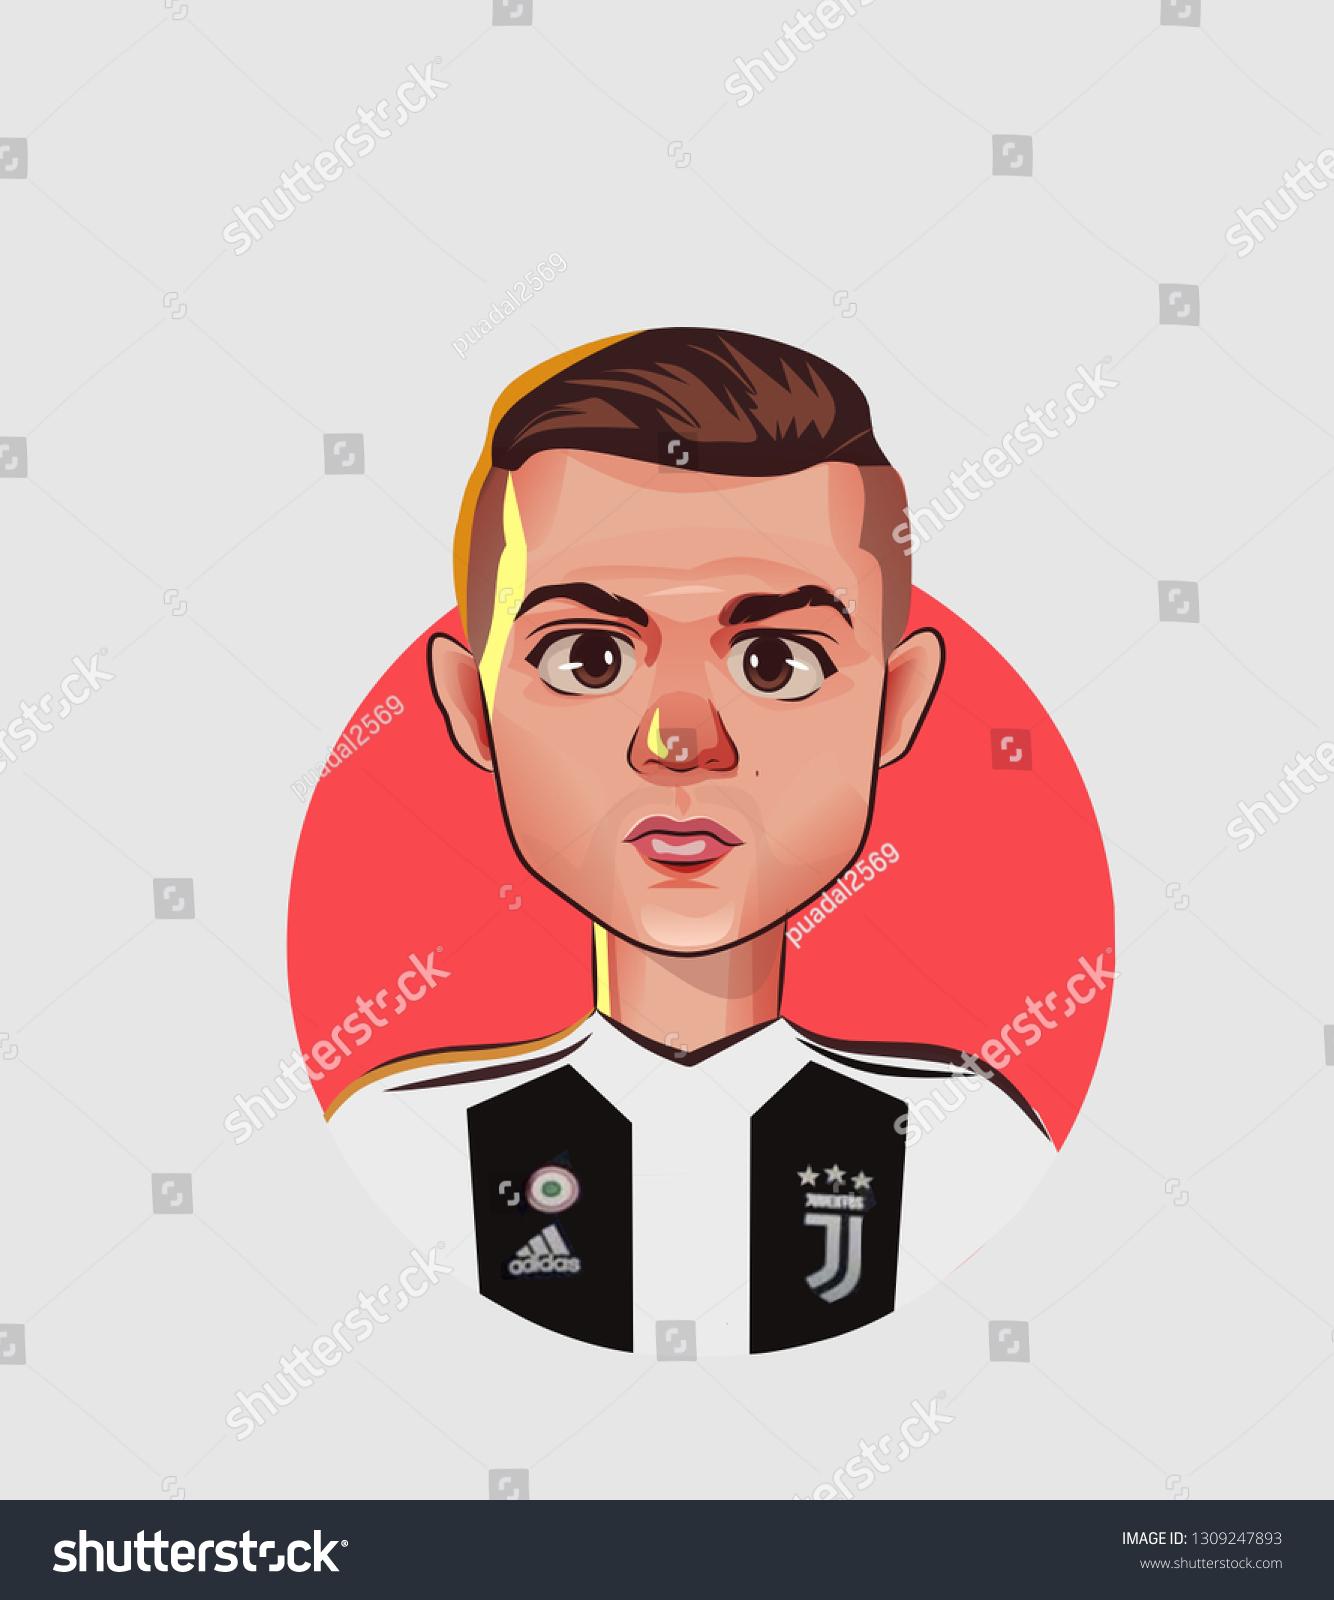 Cristiano Ronaldo Cartoon Illustration Stock Illustration 1309247893